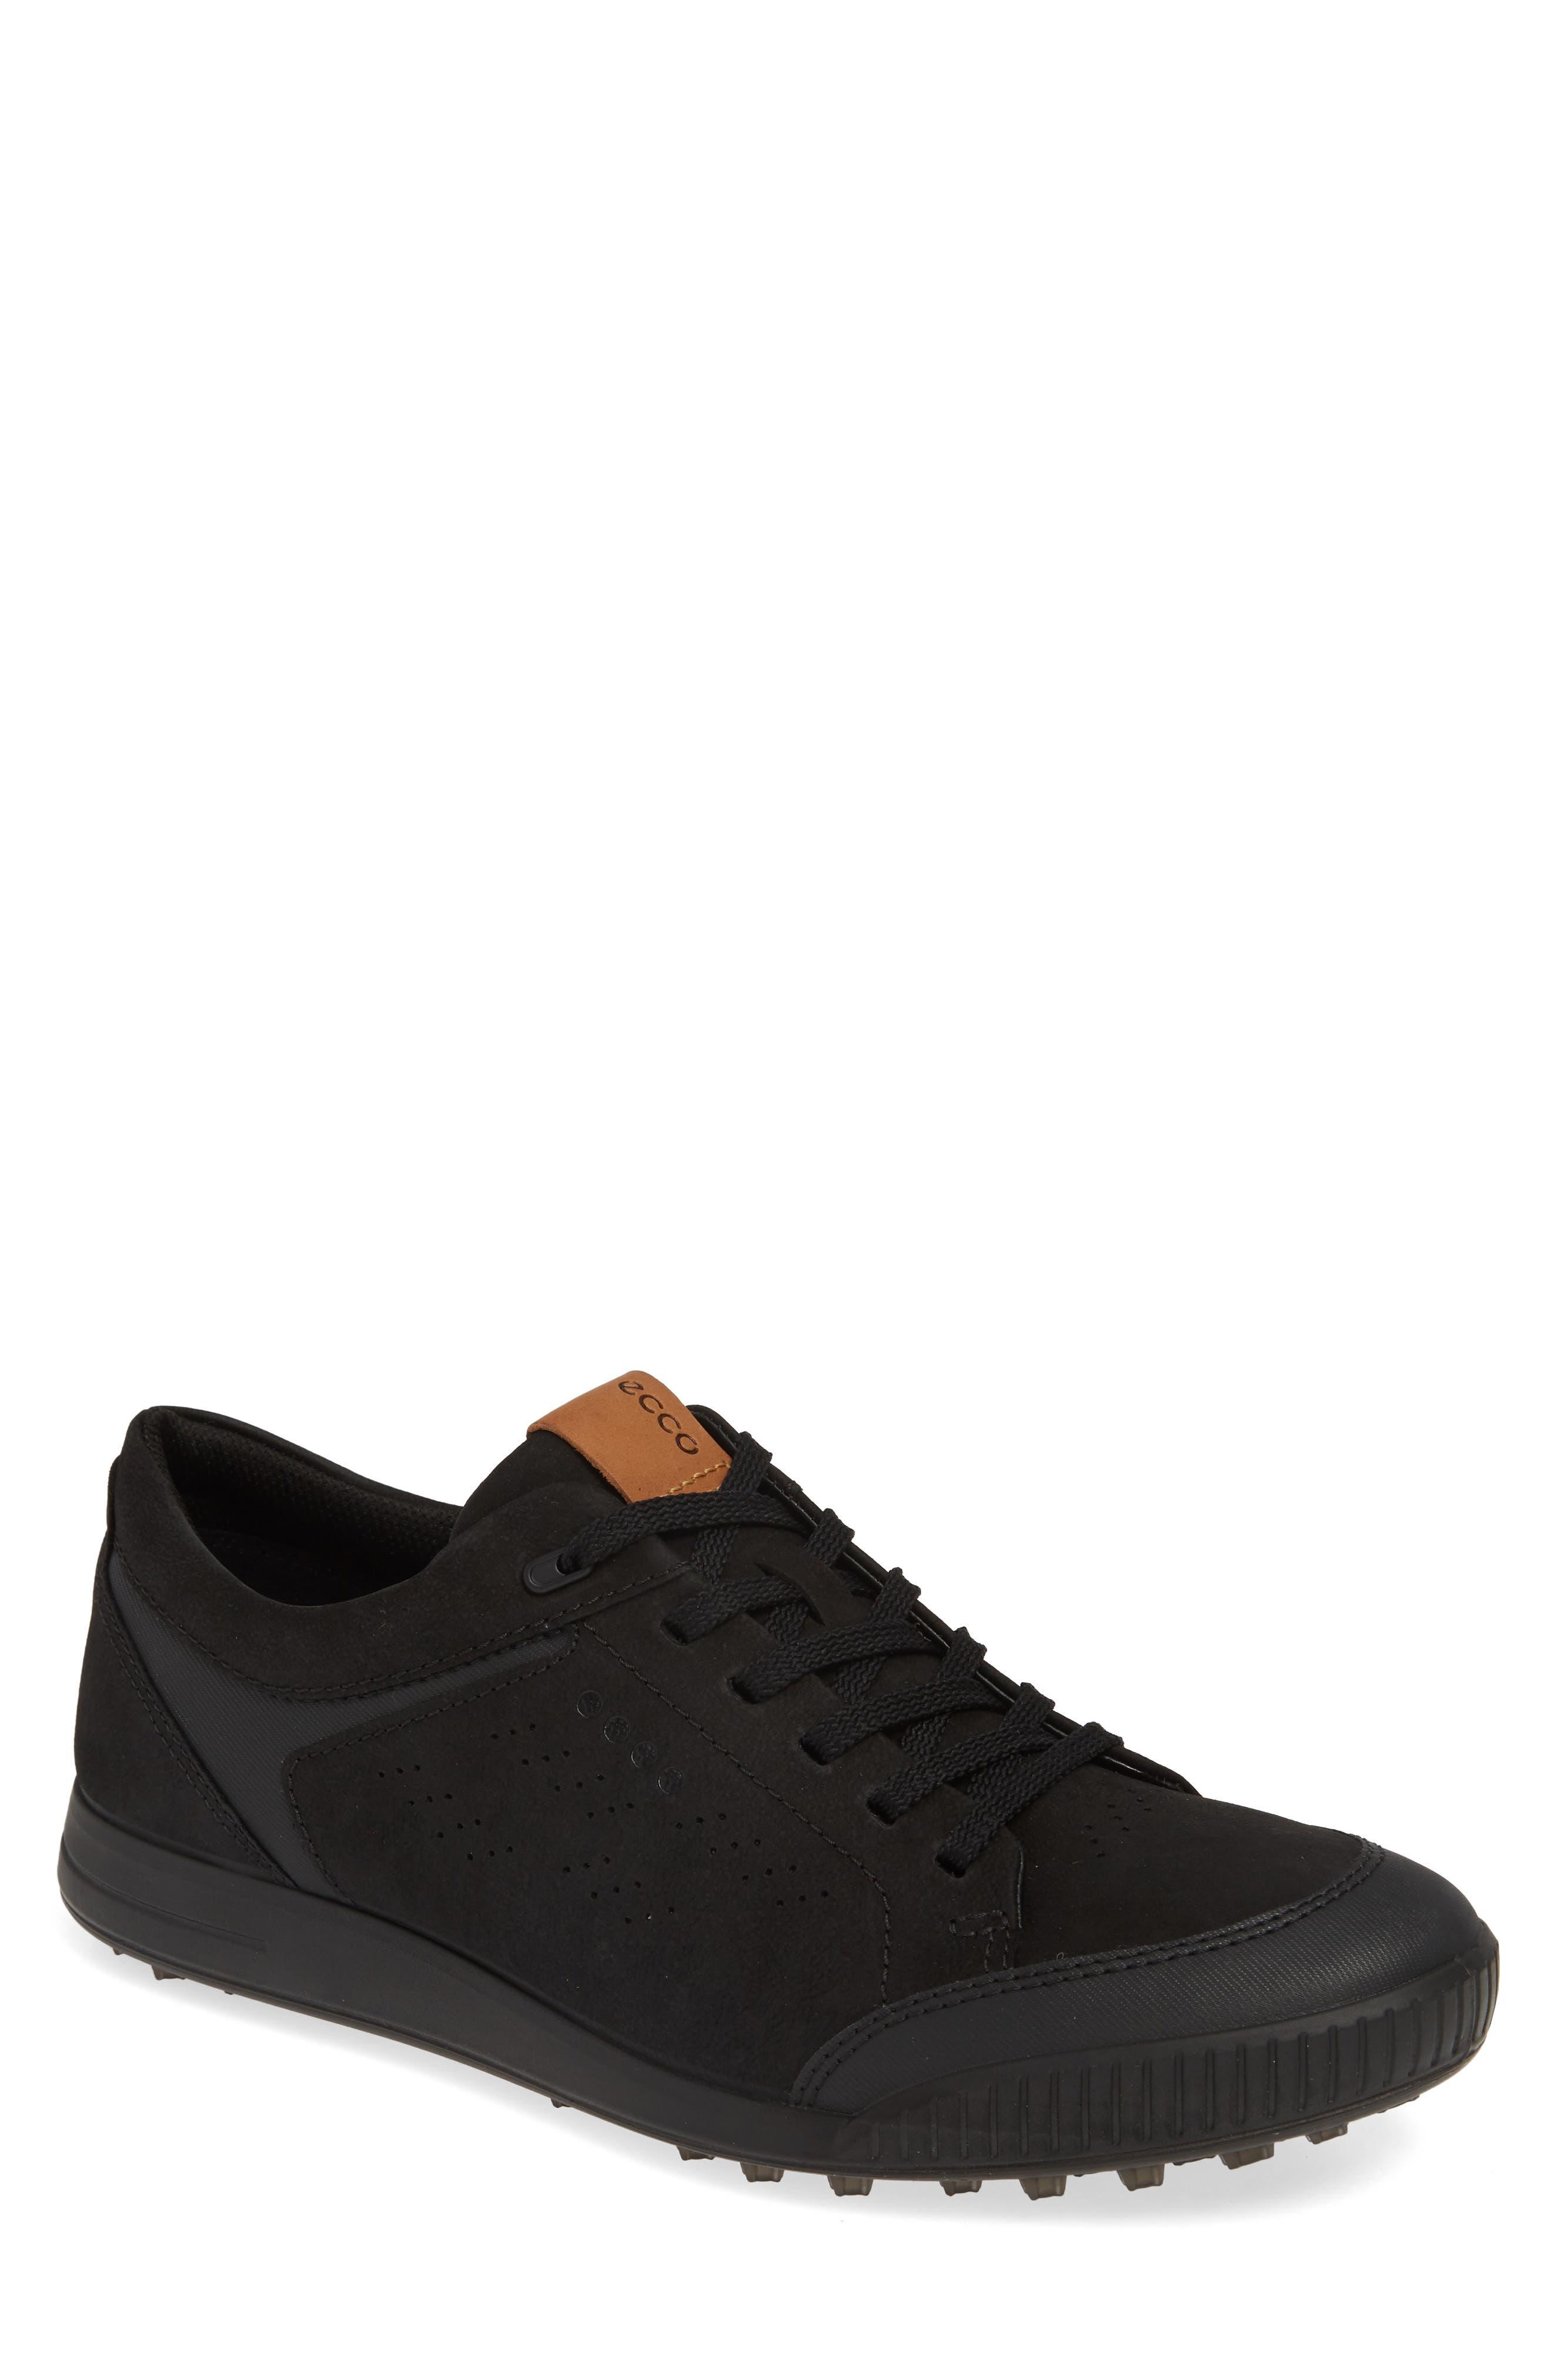 Street Retro LX Golf Shoe, Main, color, BLACK LEATHER